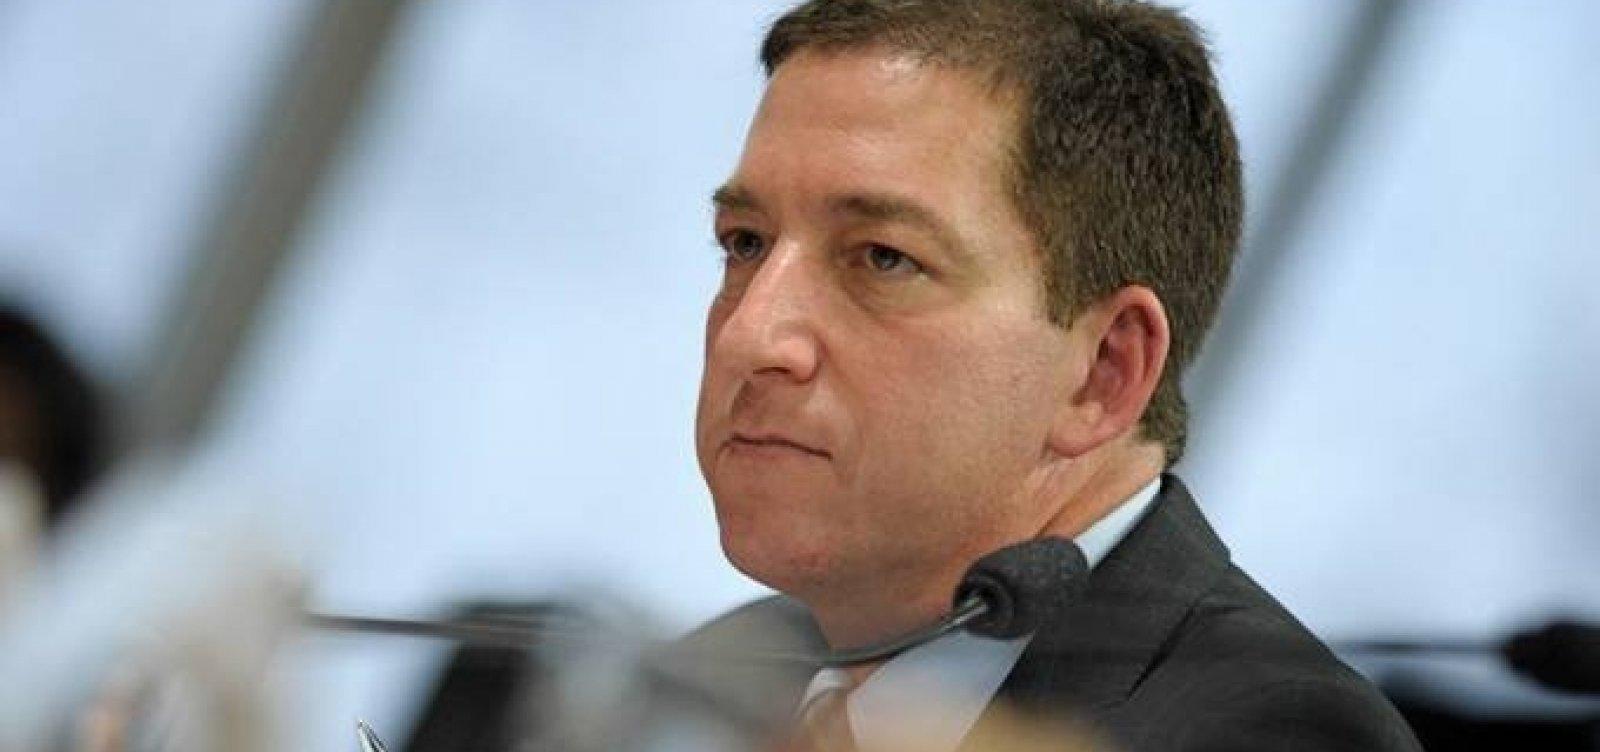 [Glenn Greenwald anuncia saída do 'The Intercept' e acusa site de censura]